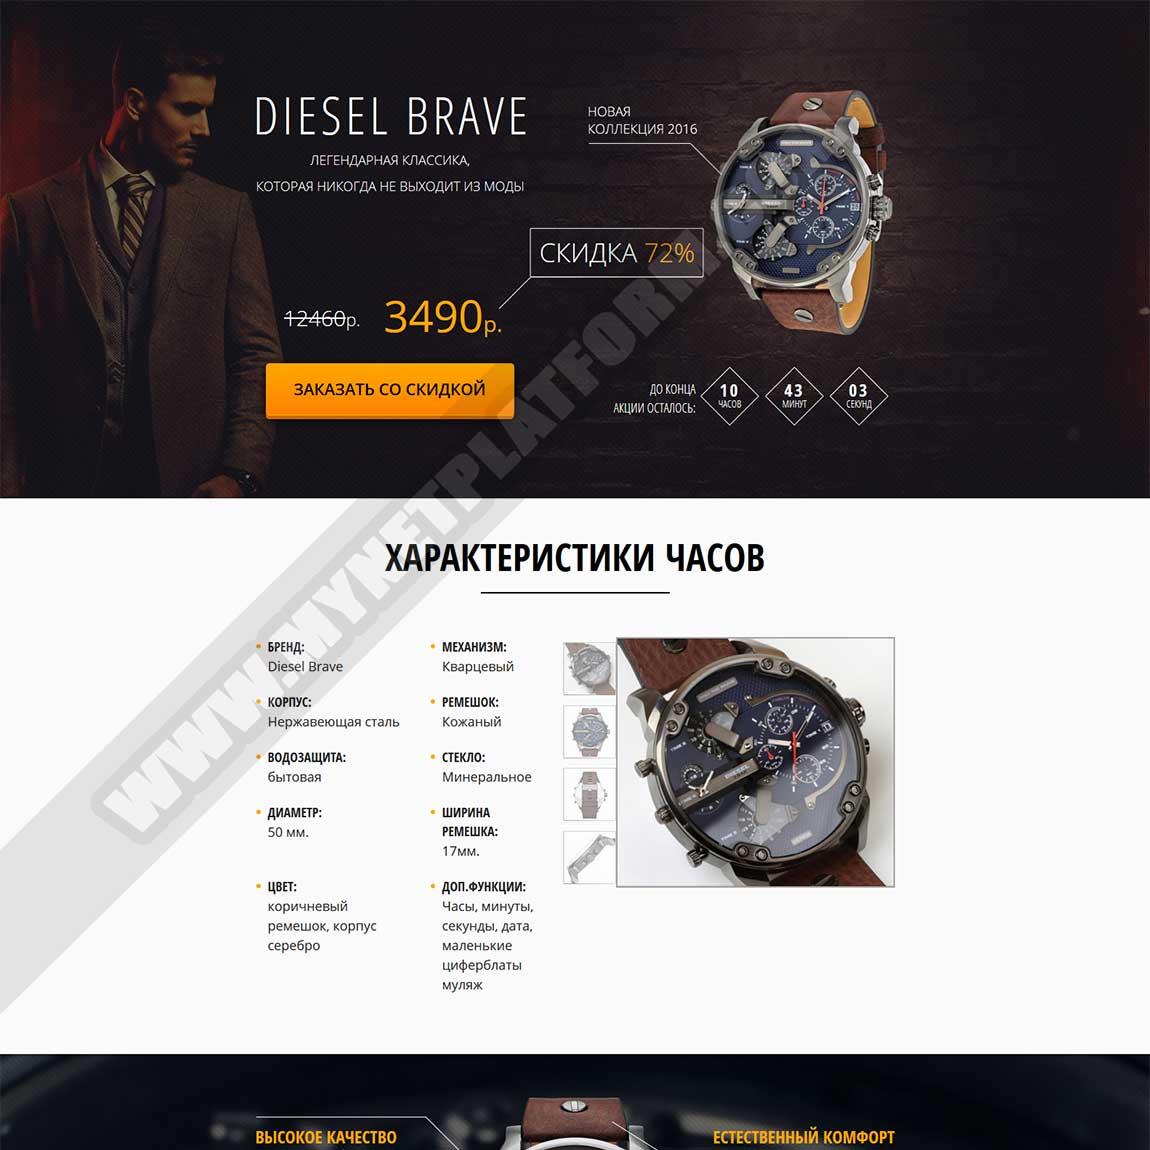 Миниатюра Готового лендинга Часы Diesel Brave 001